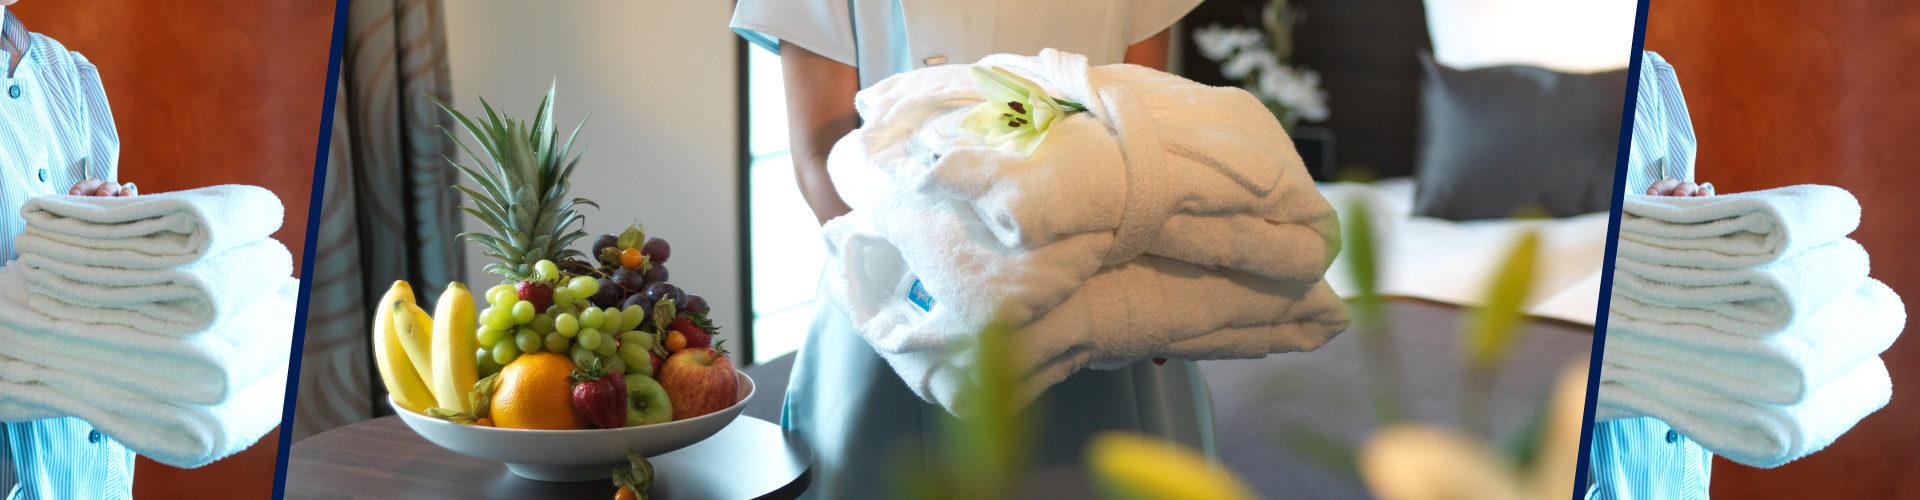 Laundry Attendant Amadeus Careers